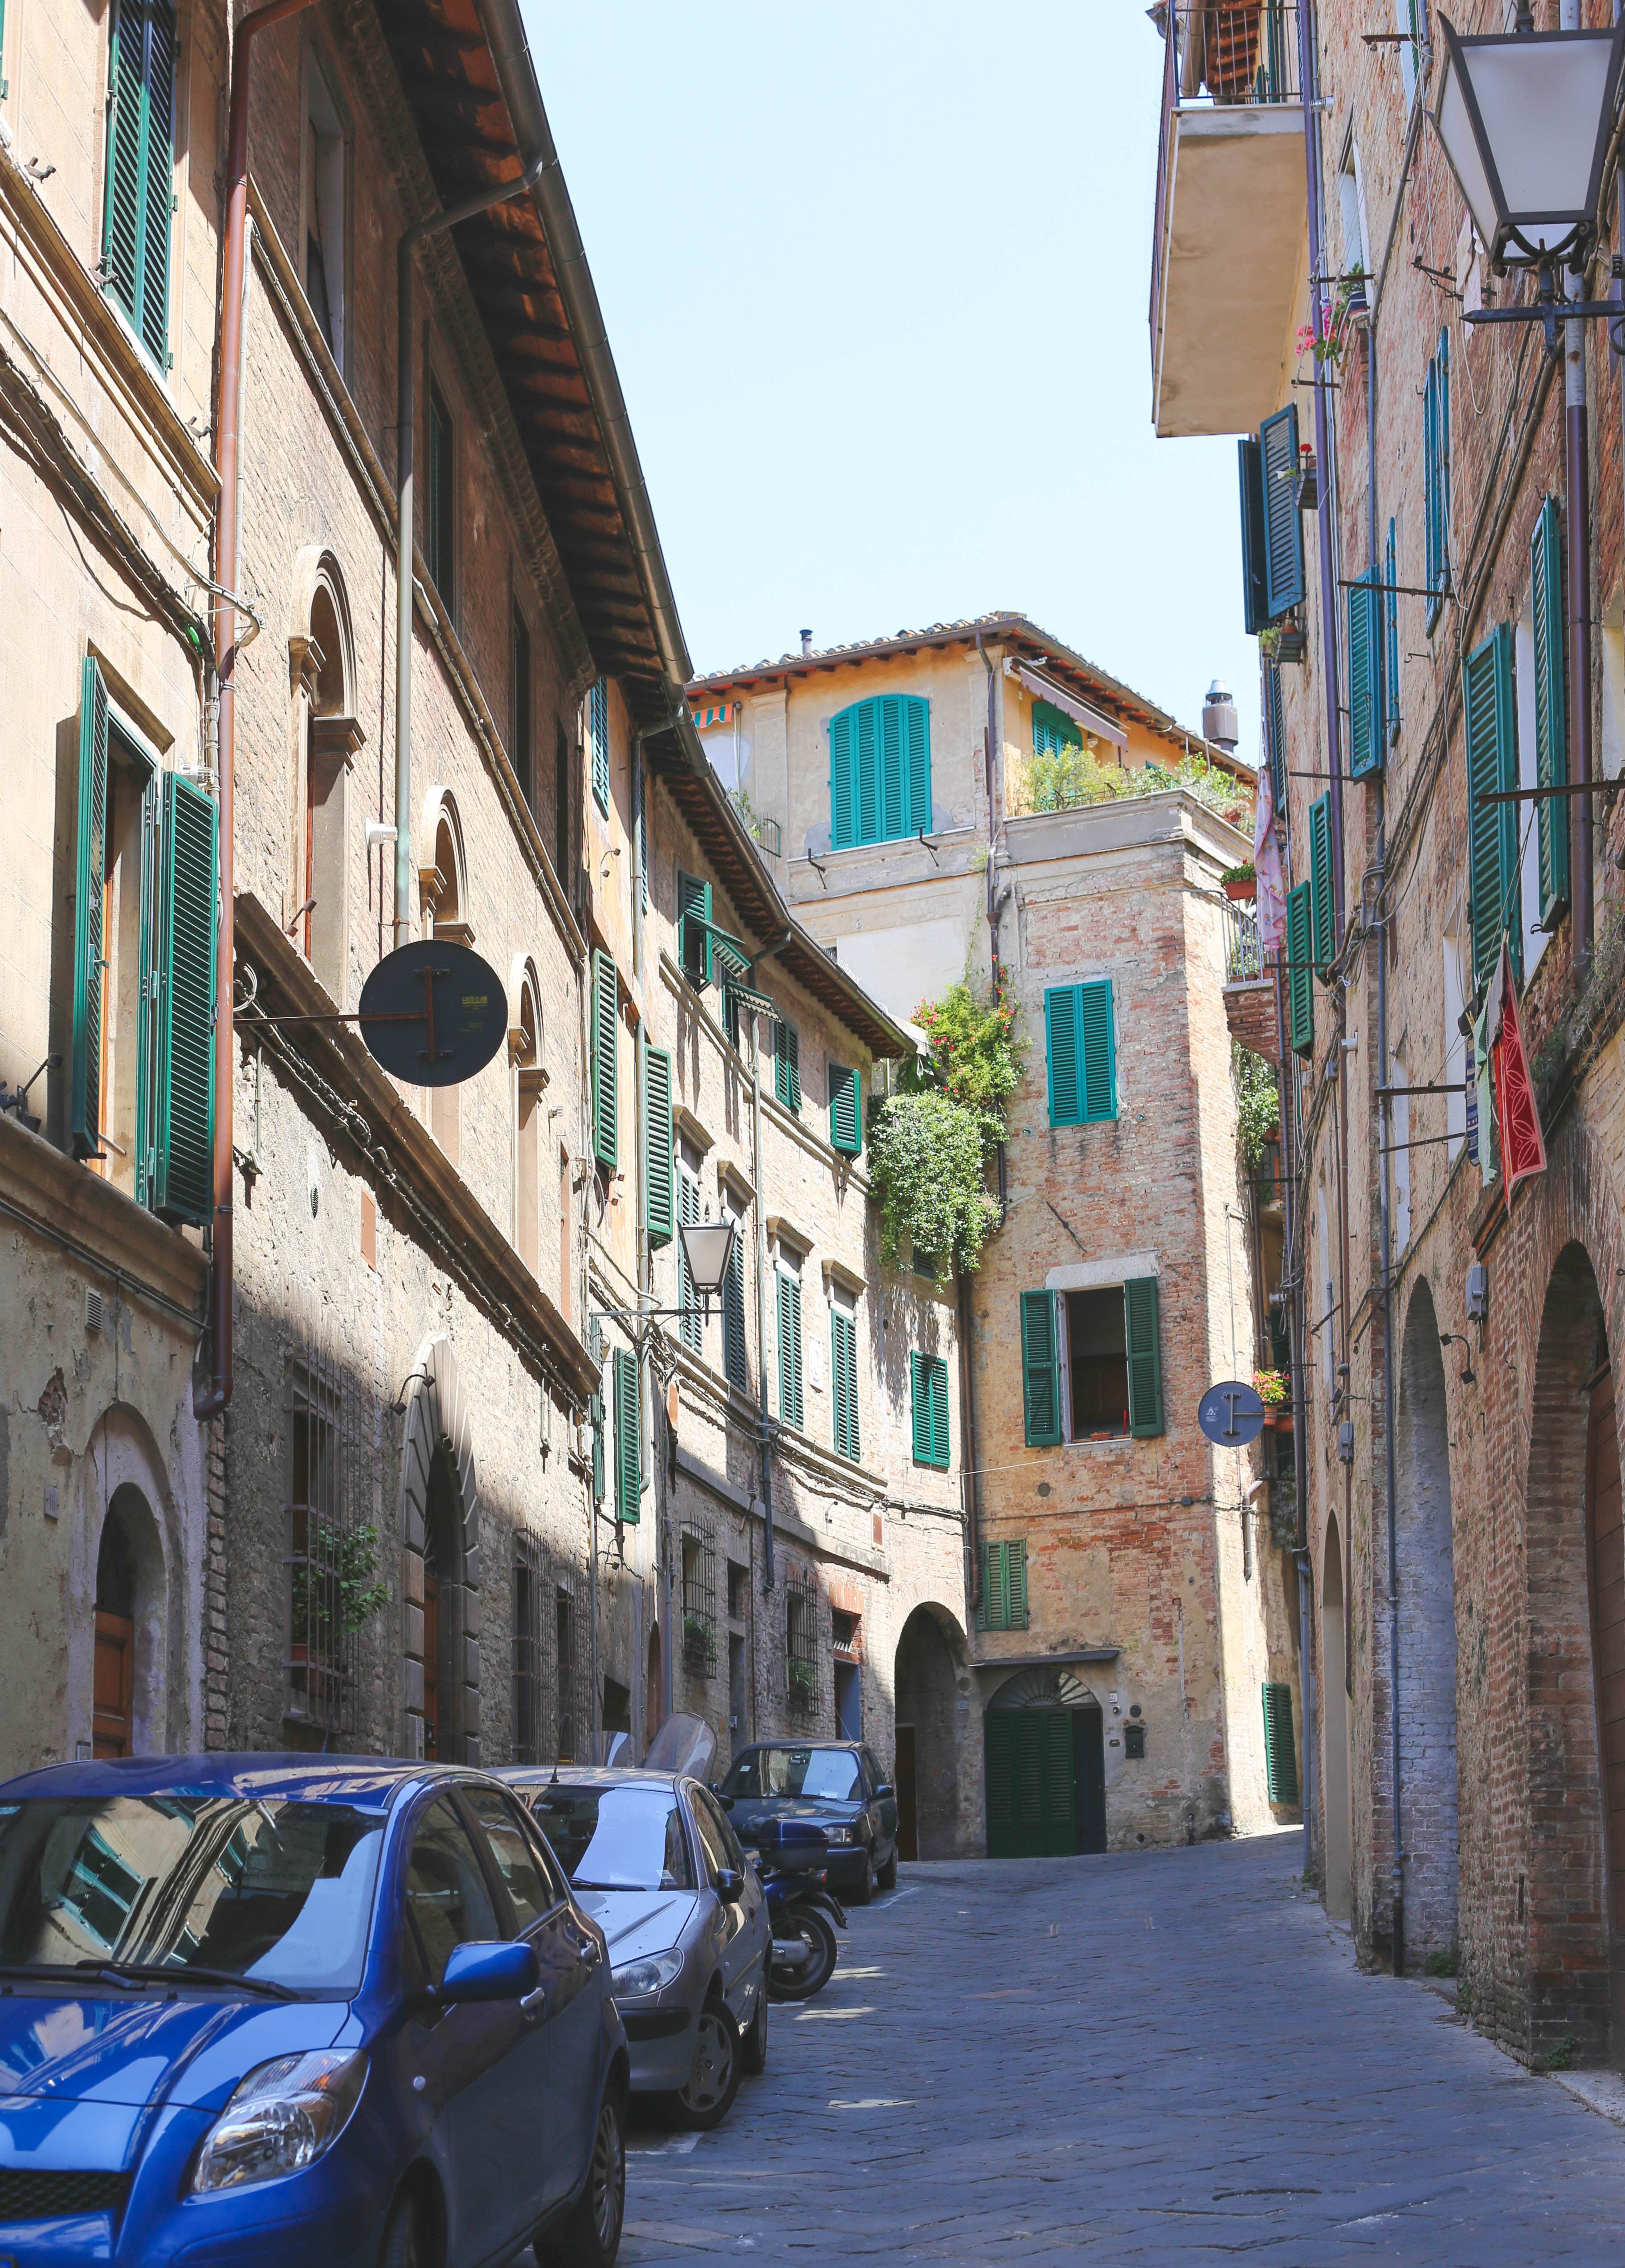 Toscana rejseguide, Siena